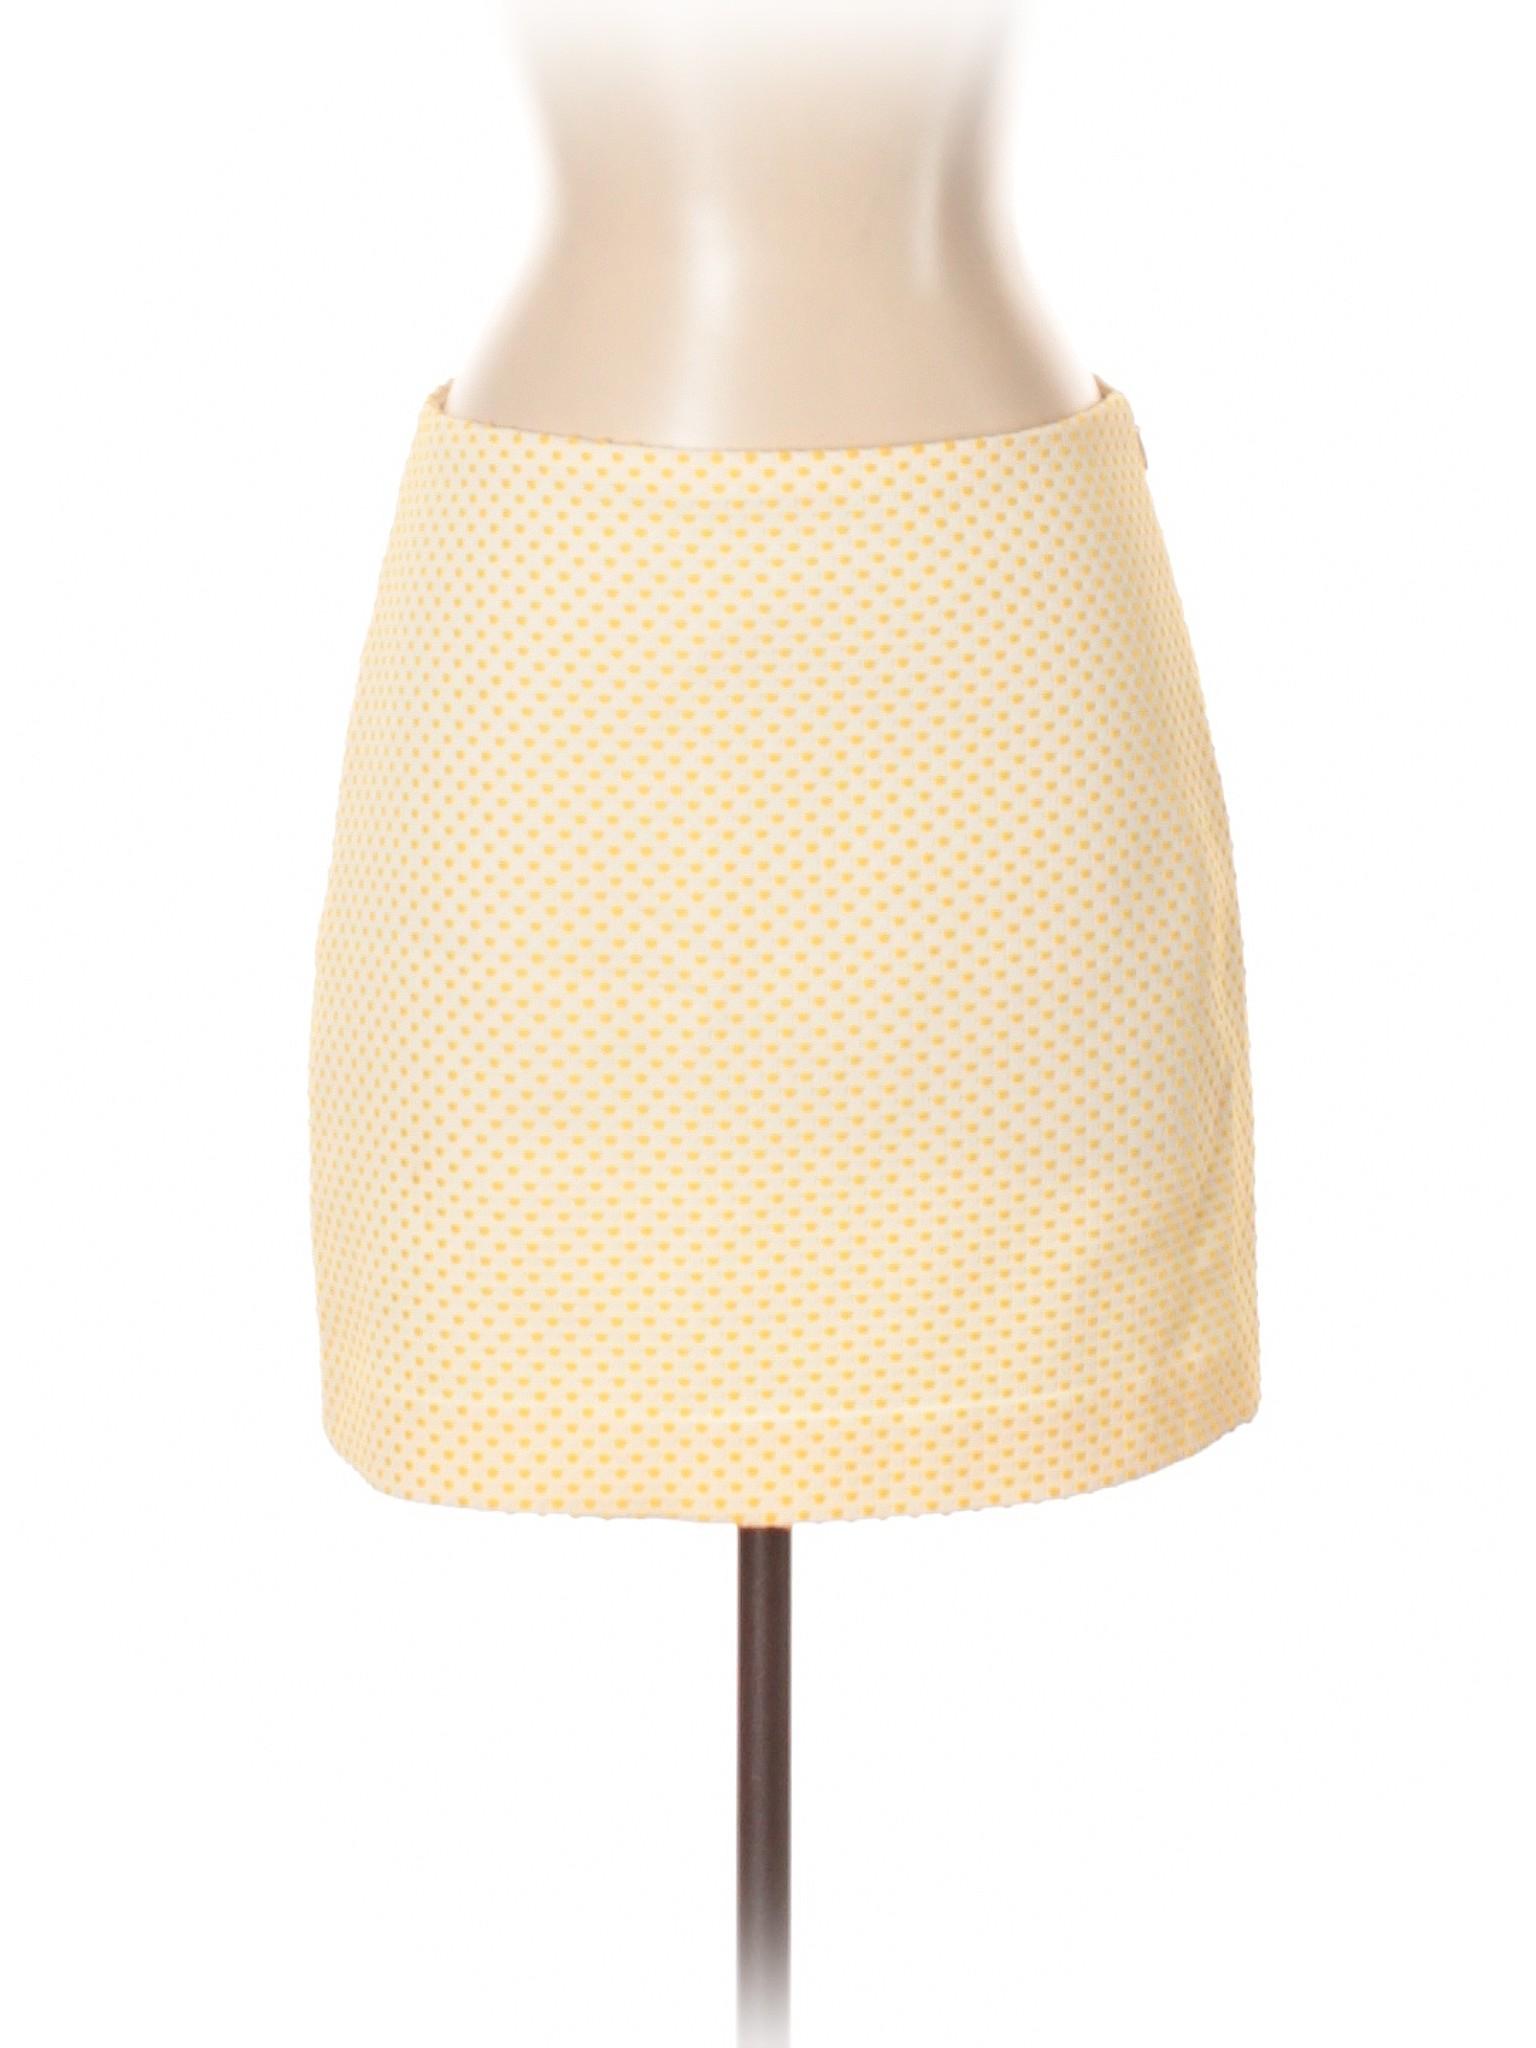 Boutique Monaco Boutique Club Club Skirt Casual 47xOBqw